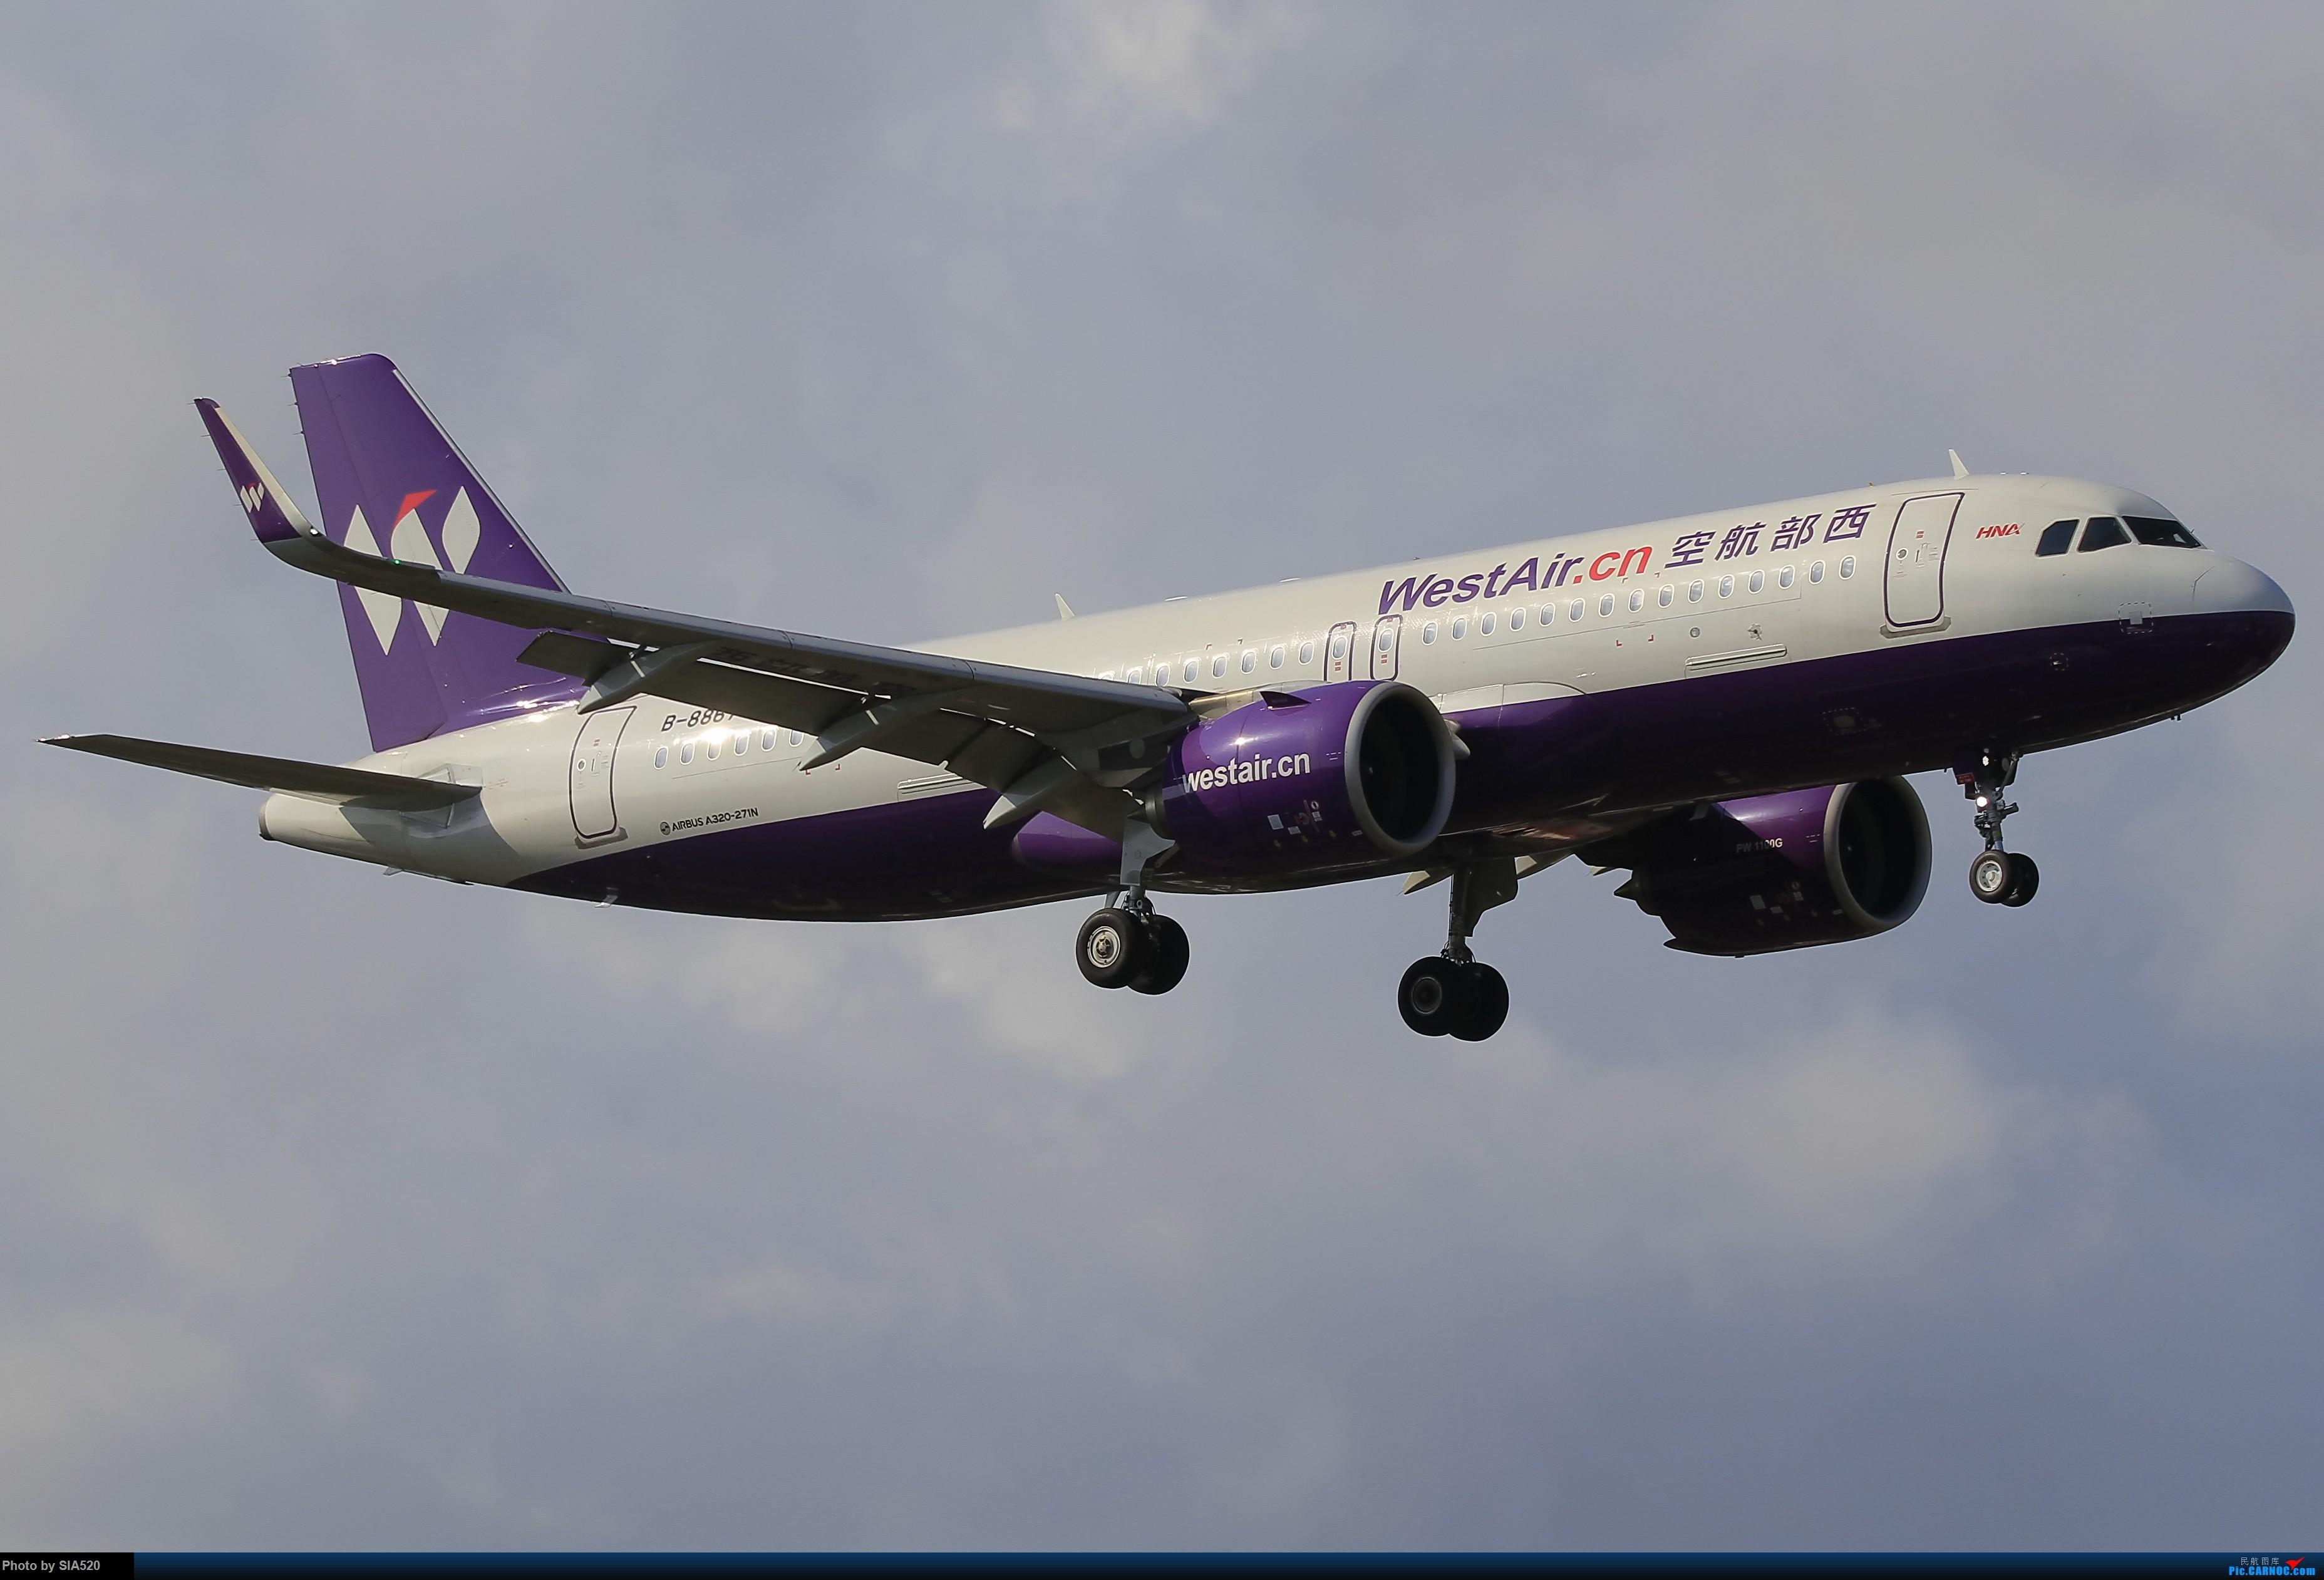 Re:[原创]北京人儿在三亚—600mm解锁凤凰 AIRBUS A320NEO B-8867 中国三亚凤凰国际机场